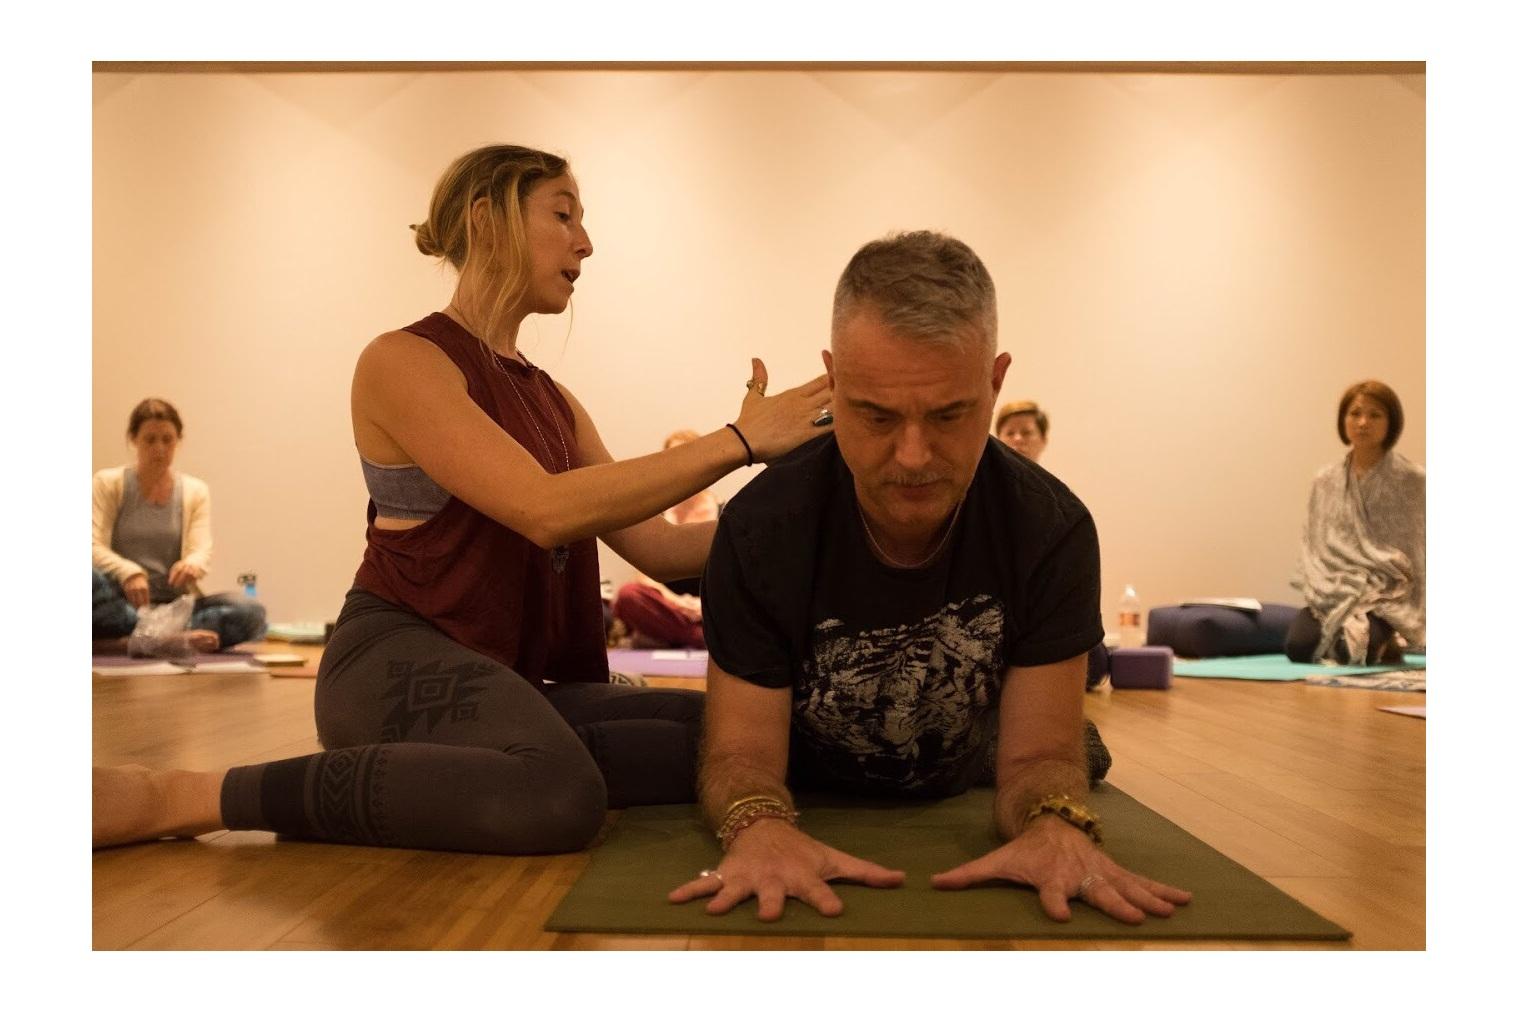 kali-durga-yoga-yin-17.jpg